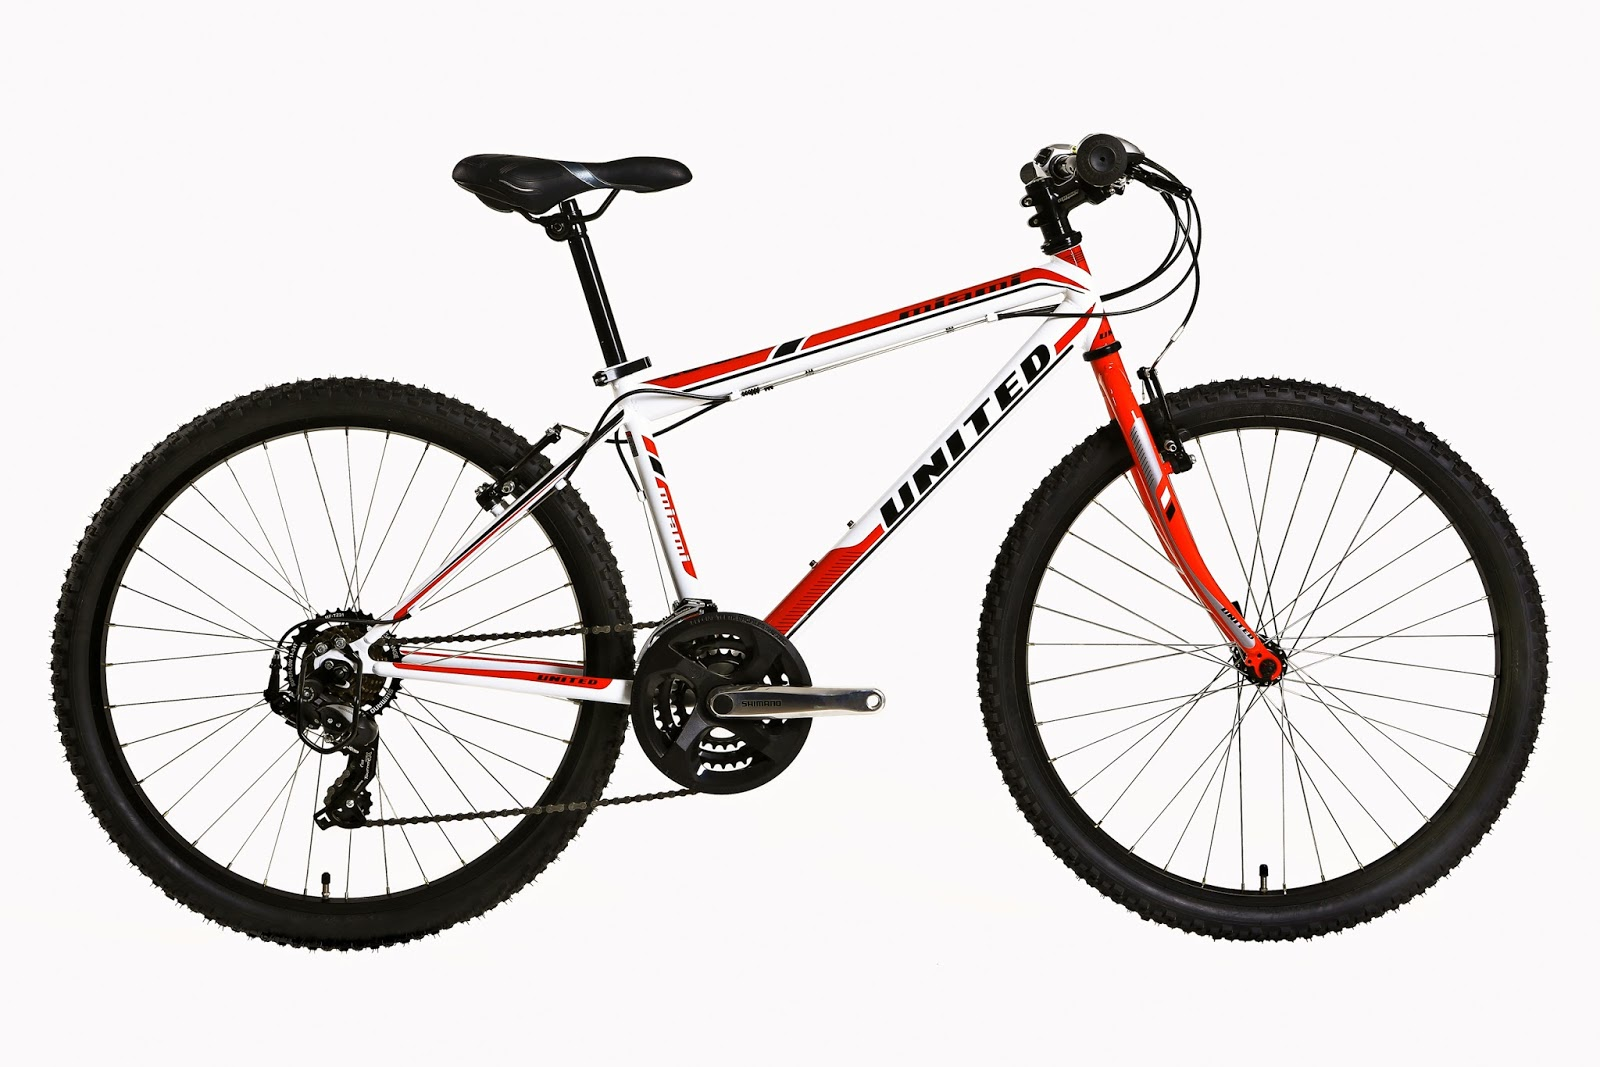 Sepeda United Miami XC 01 Rp.1.200.000. DBS Bicycle